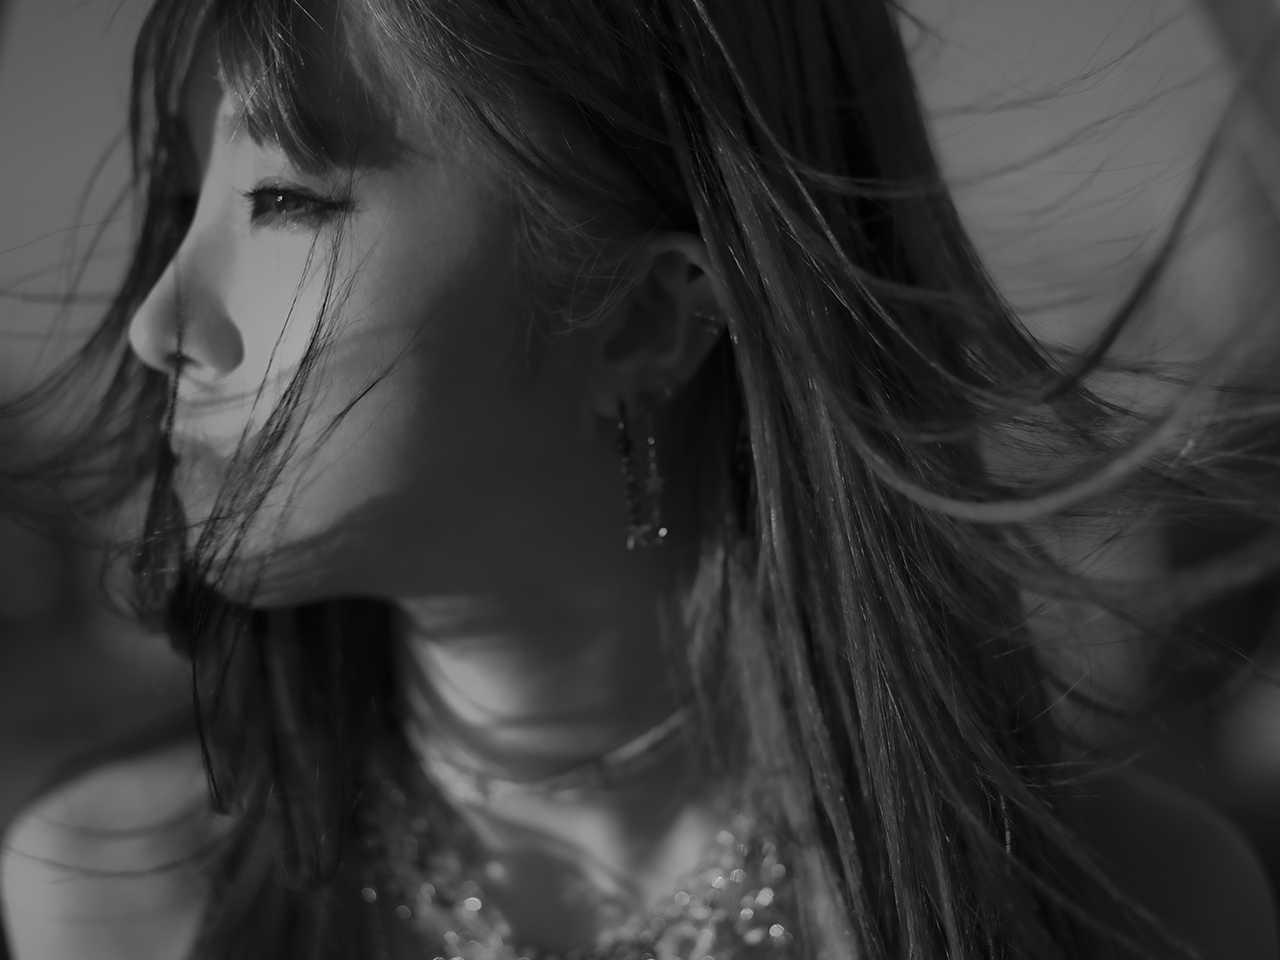 LiSA、シングルカップリング曲「ハウル」のMV公開&AbemaTV特番用特典情報解禁!